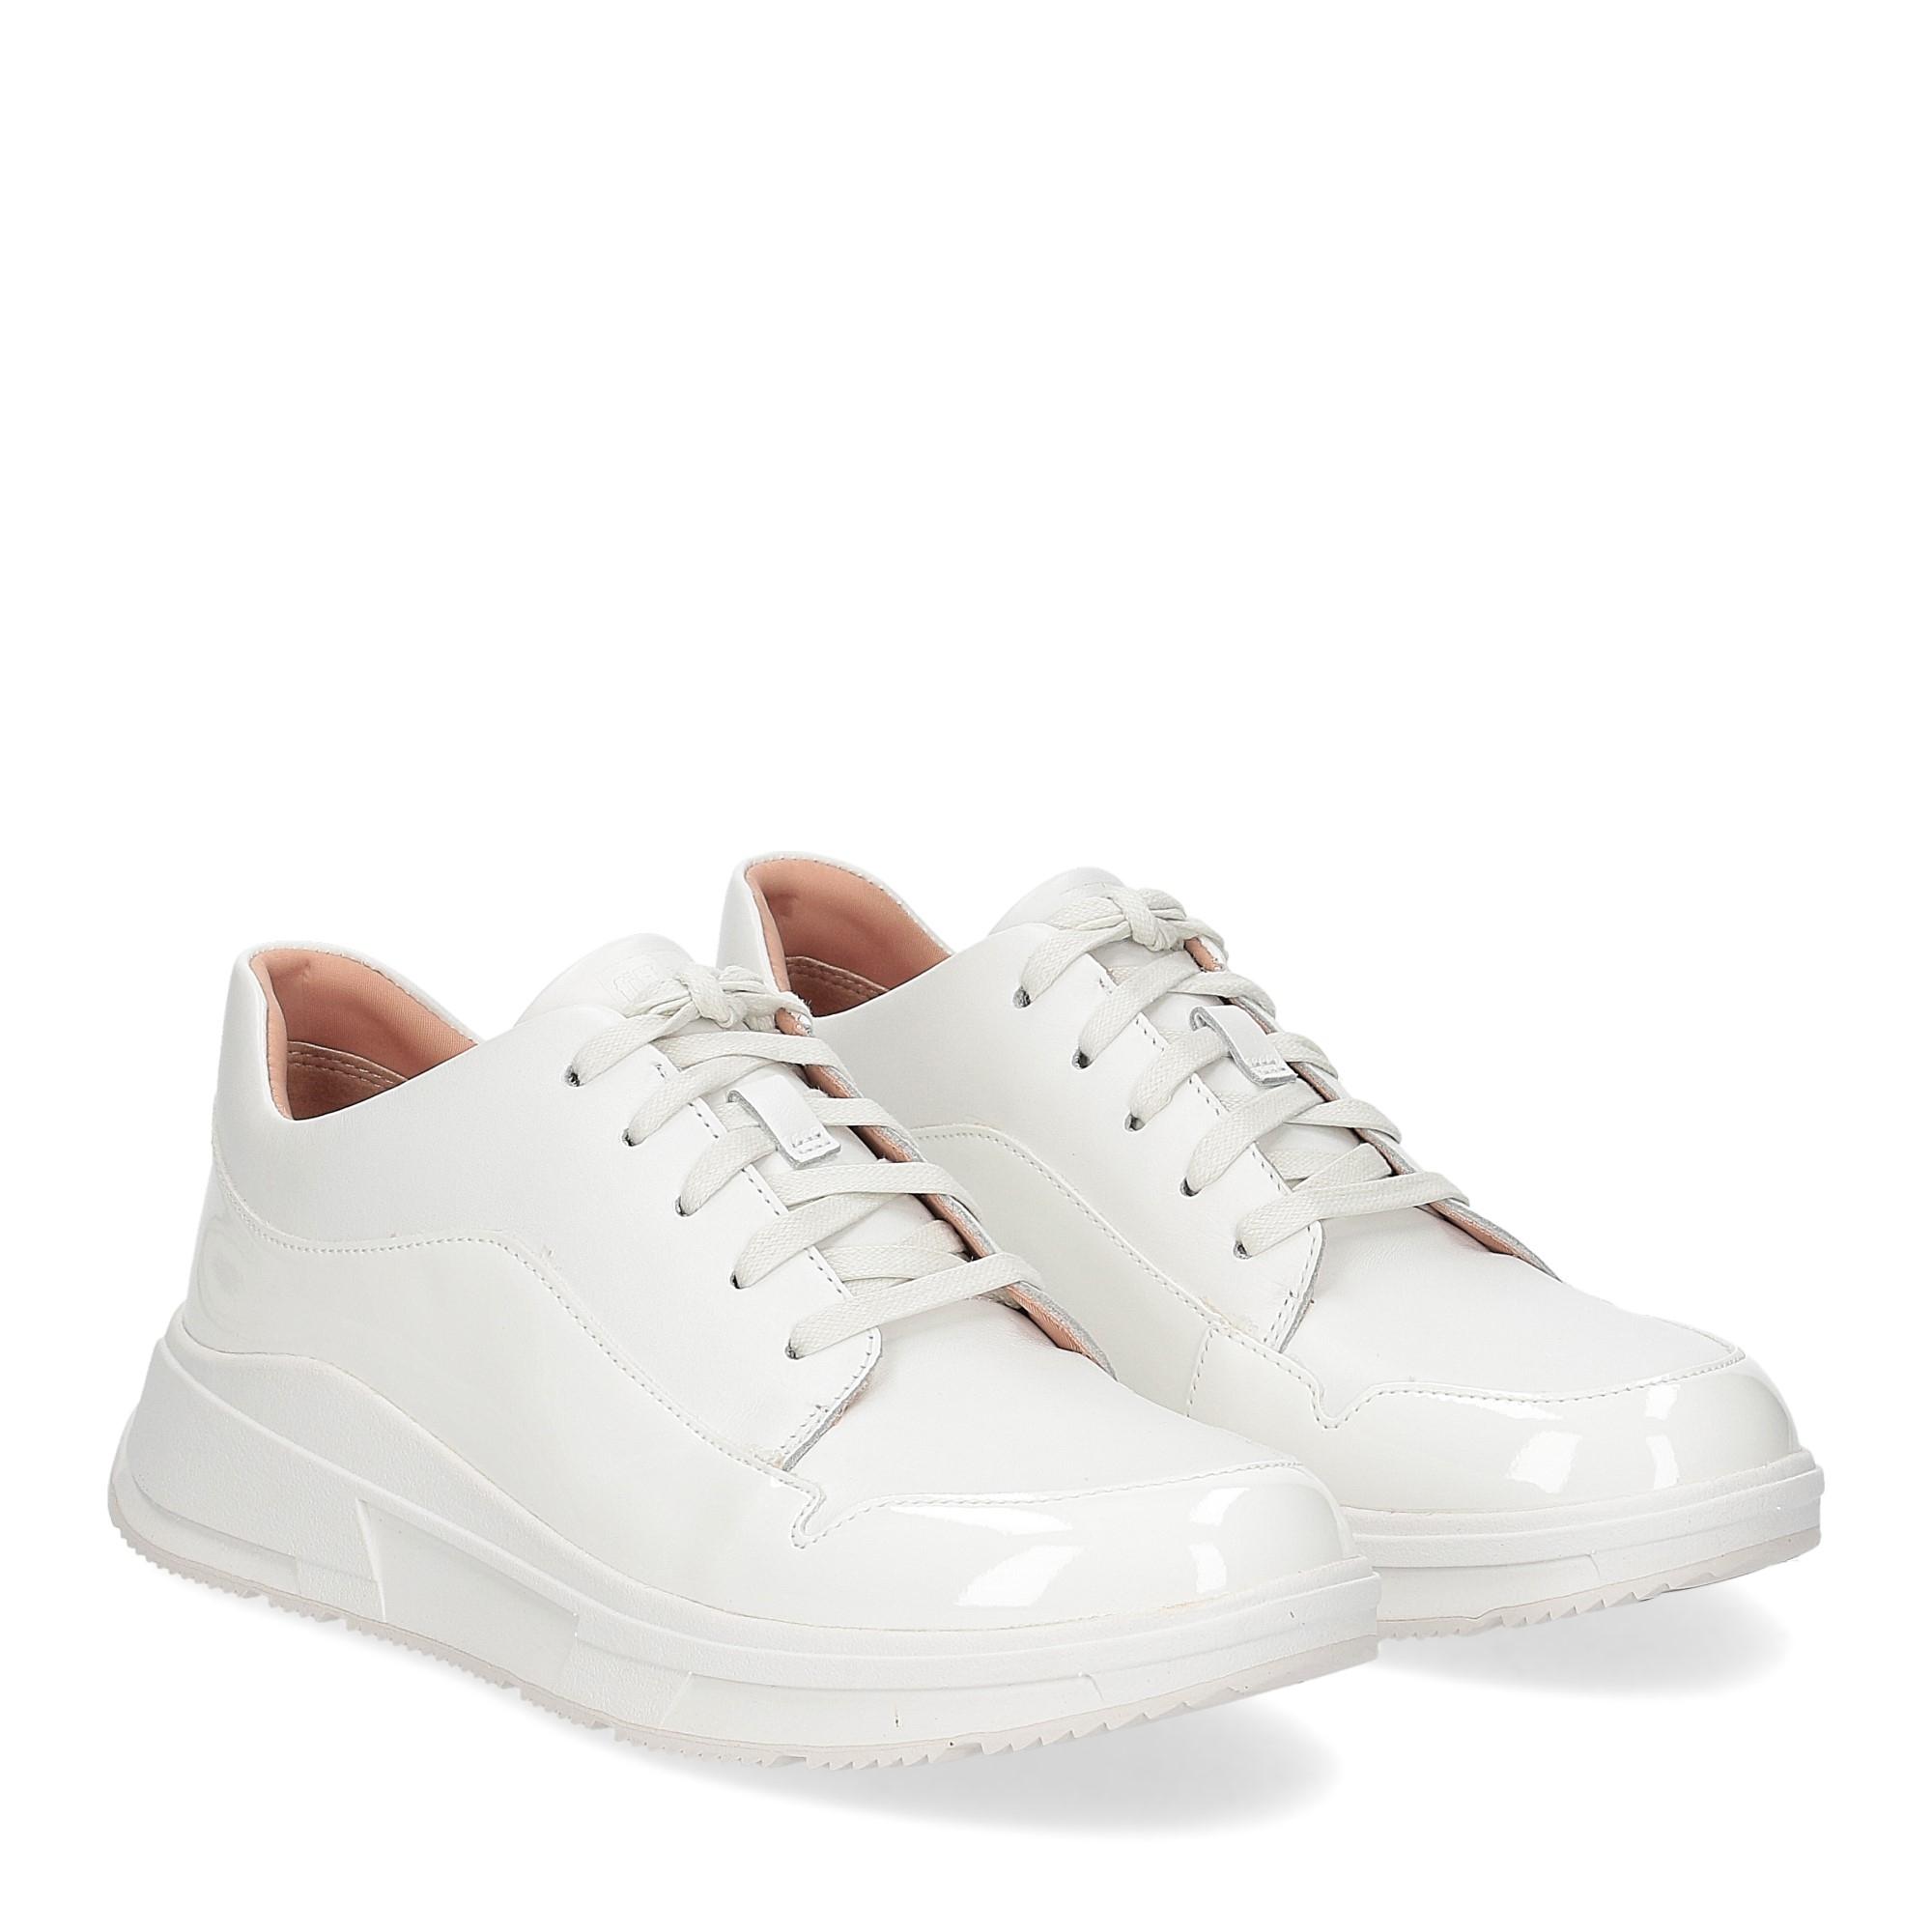 Fitflop Freya sneakers urban white